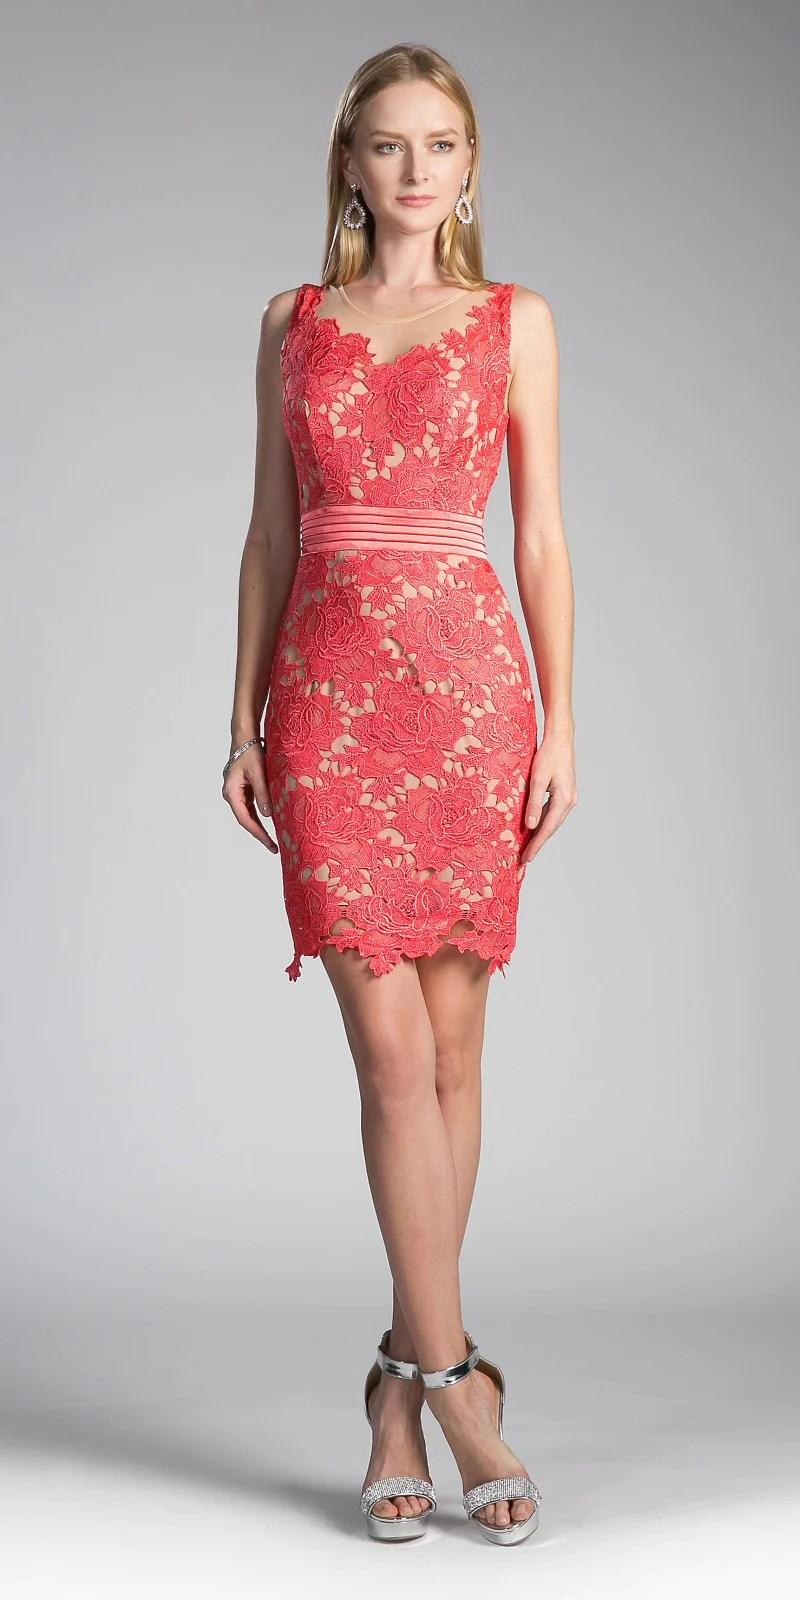 Cinderella Divine Cf053 Sleeveless Lace Overlay Orange